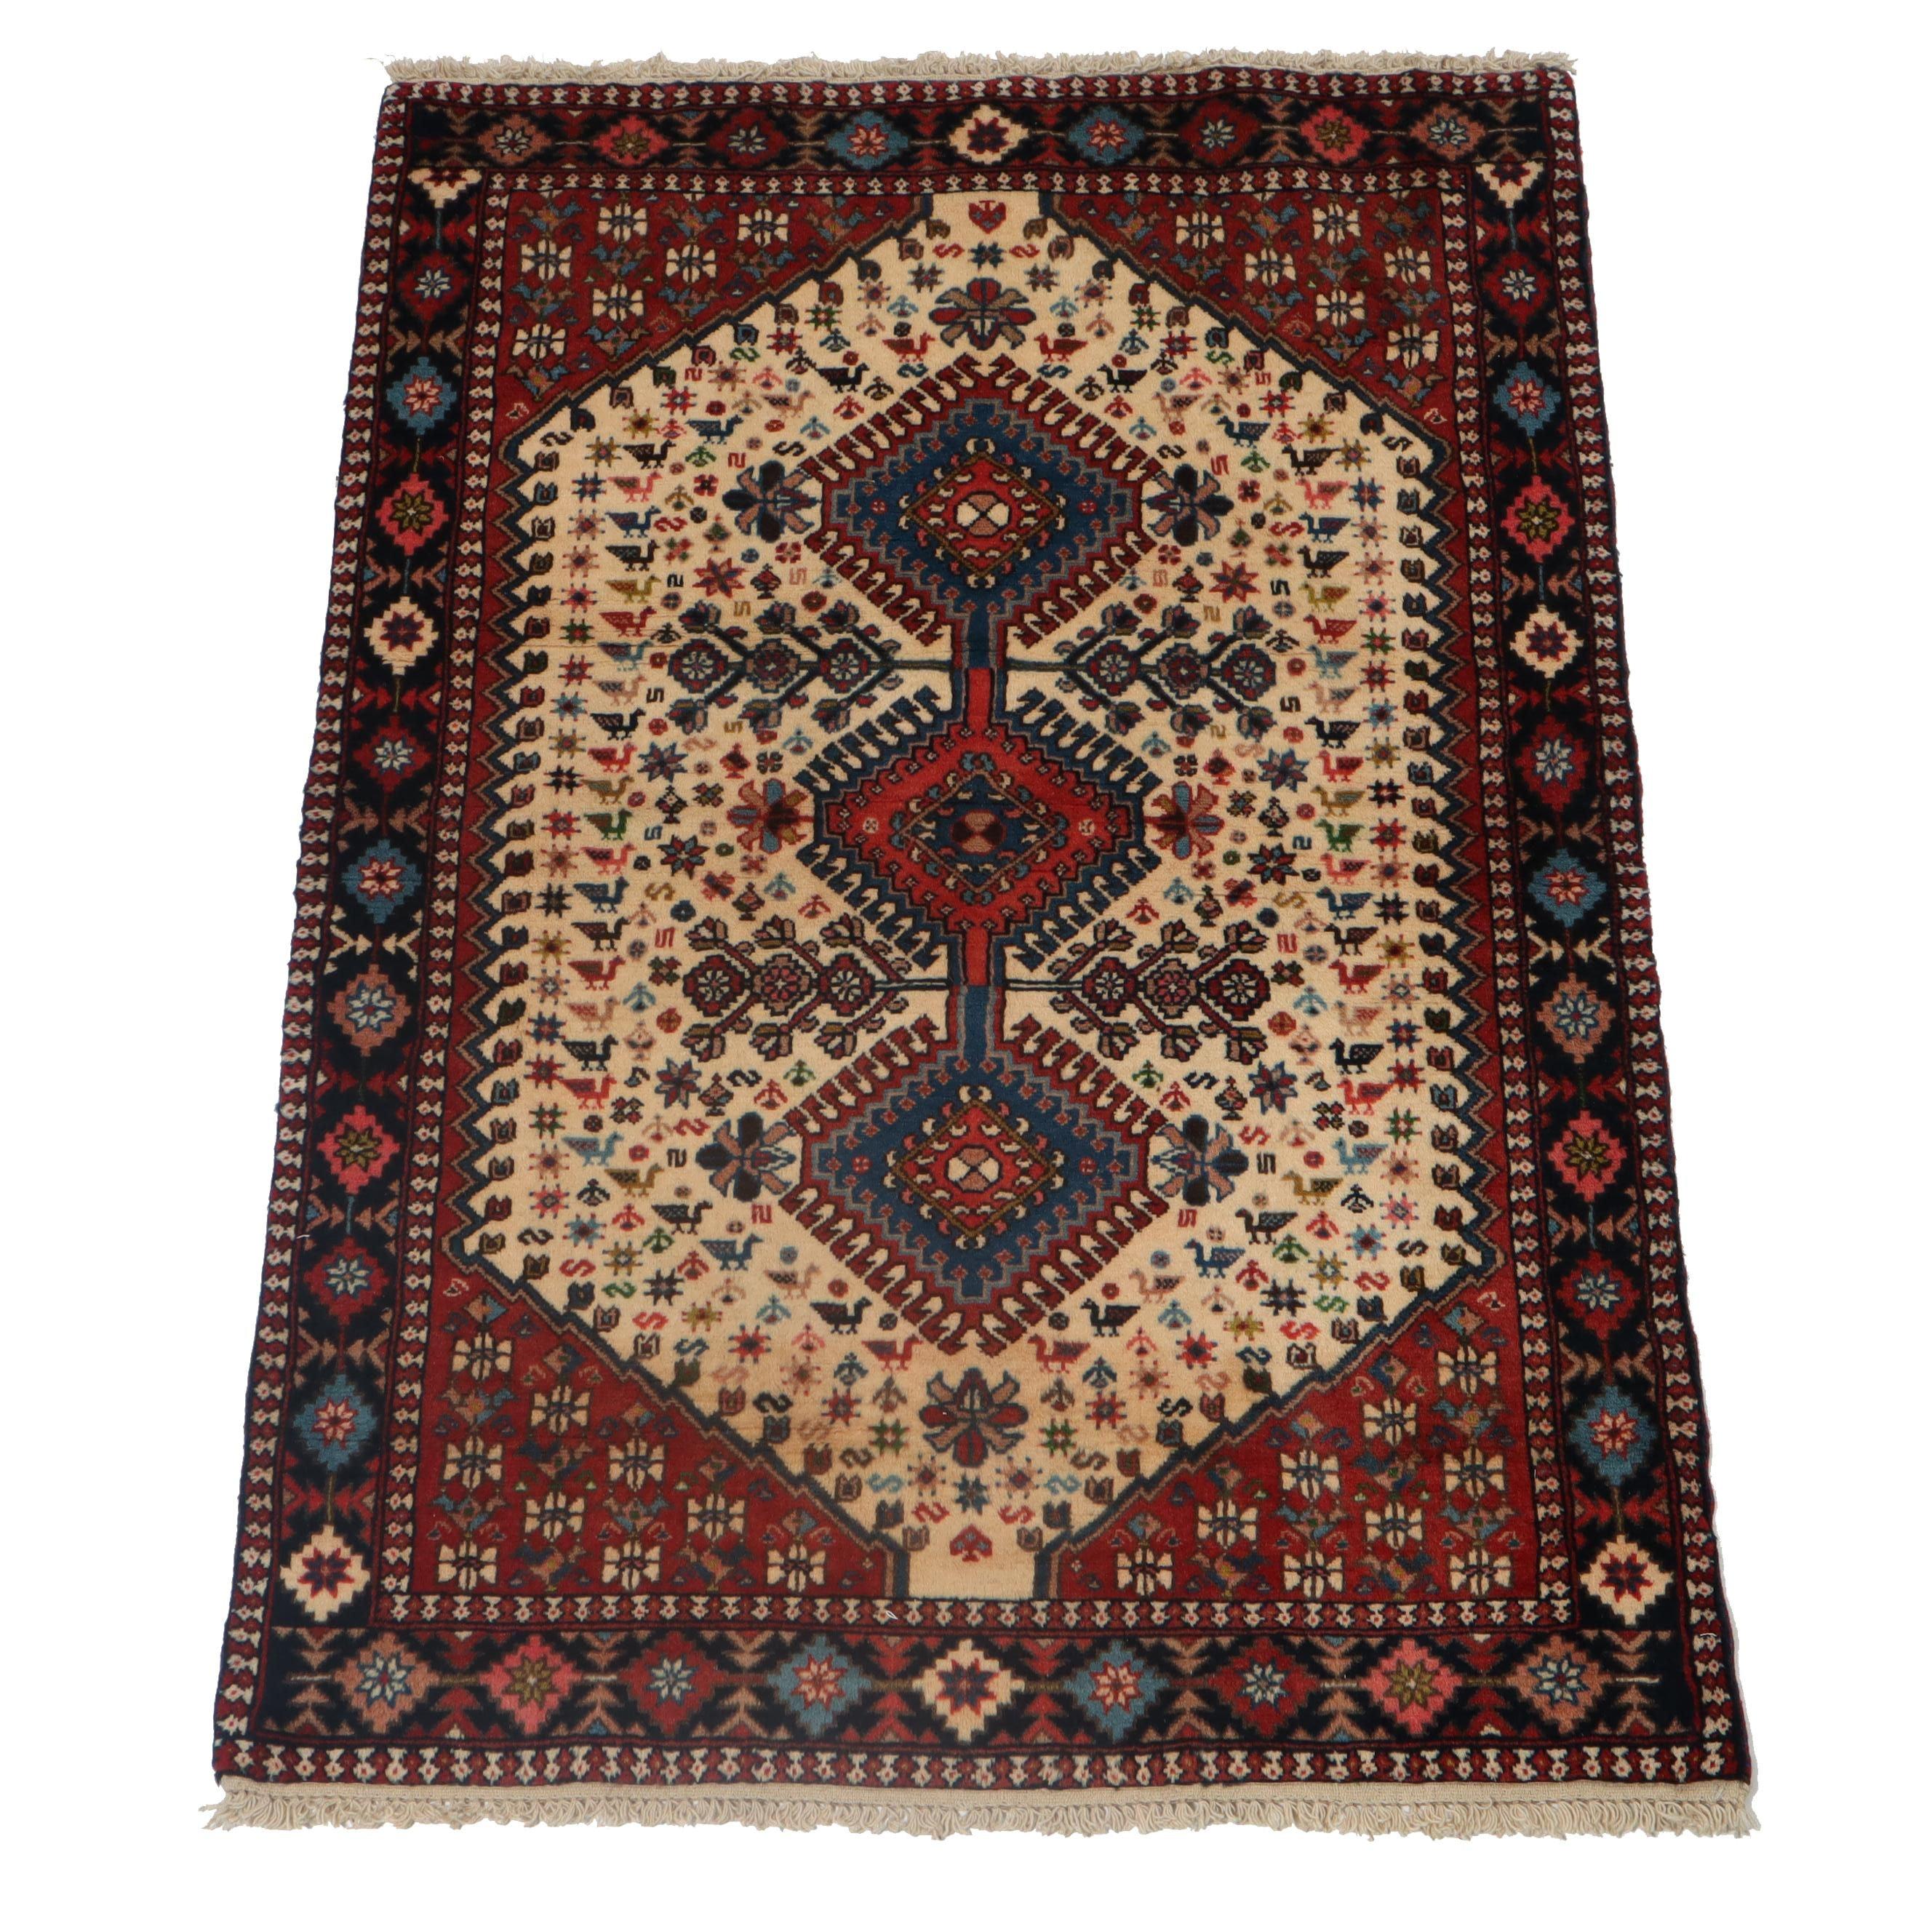 3.5' x 5' Hand-Knotted Persian Yalameh Shiraz Wool Rug, Circa 1970s